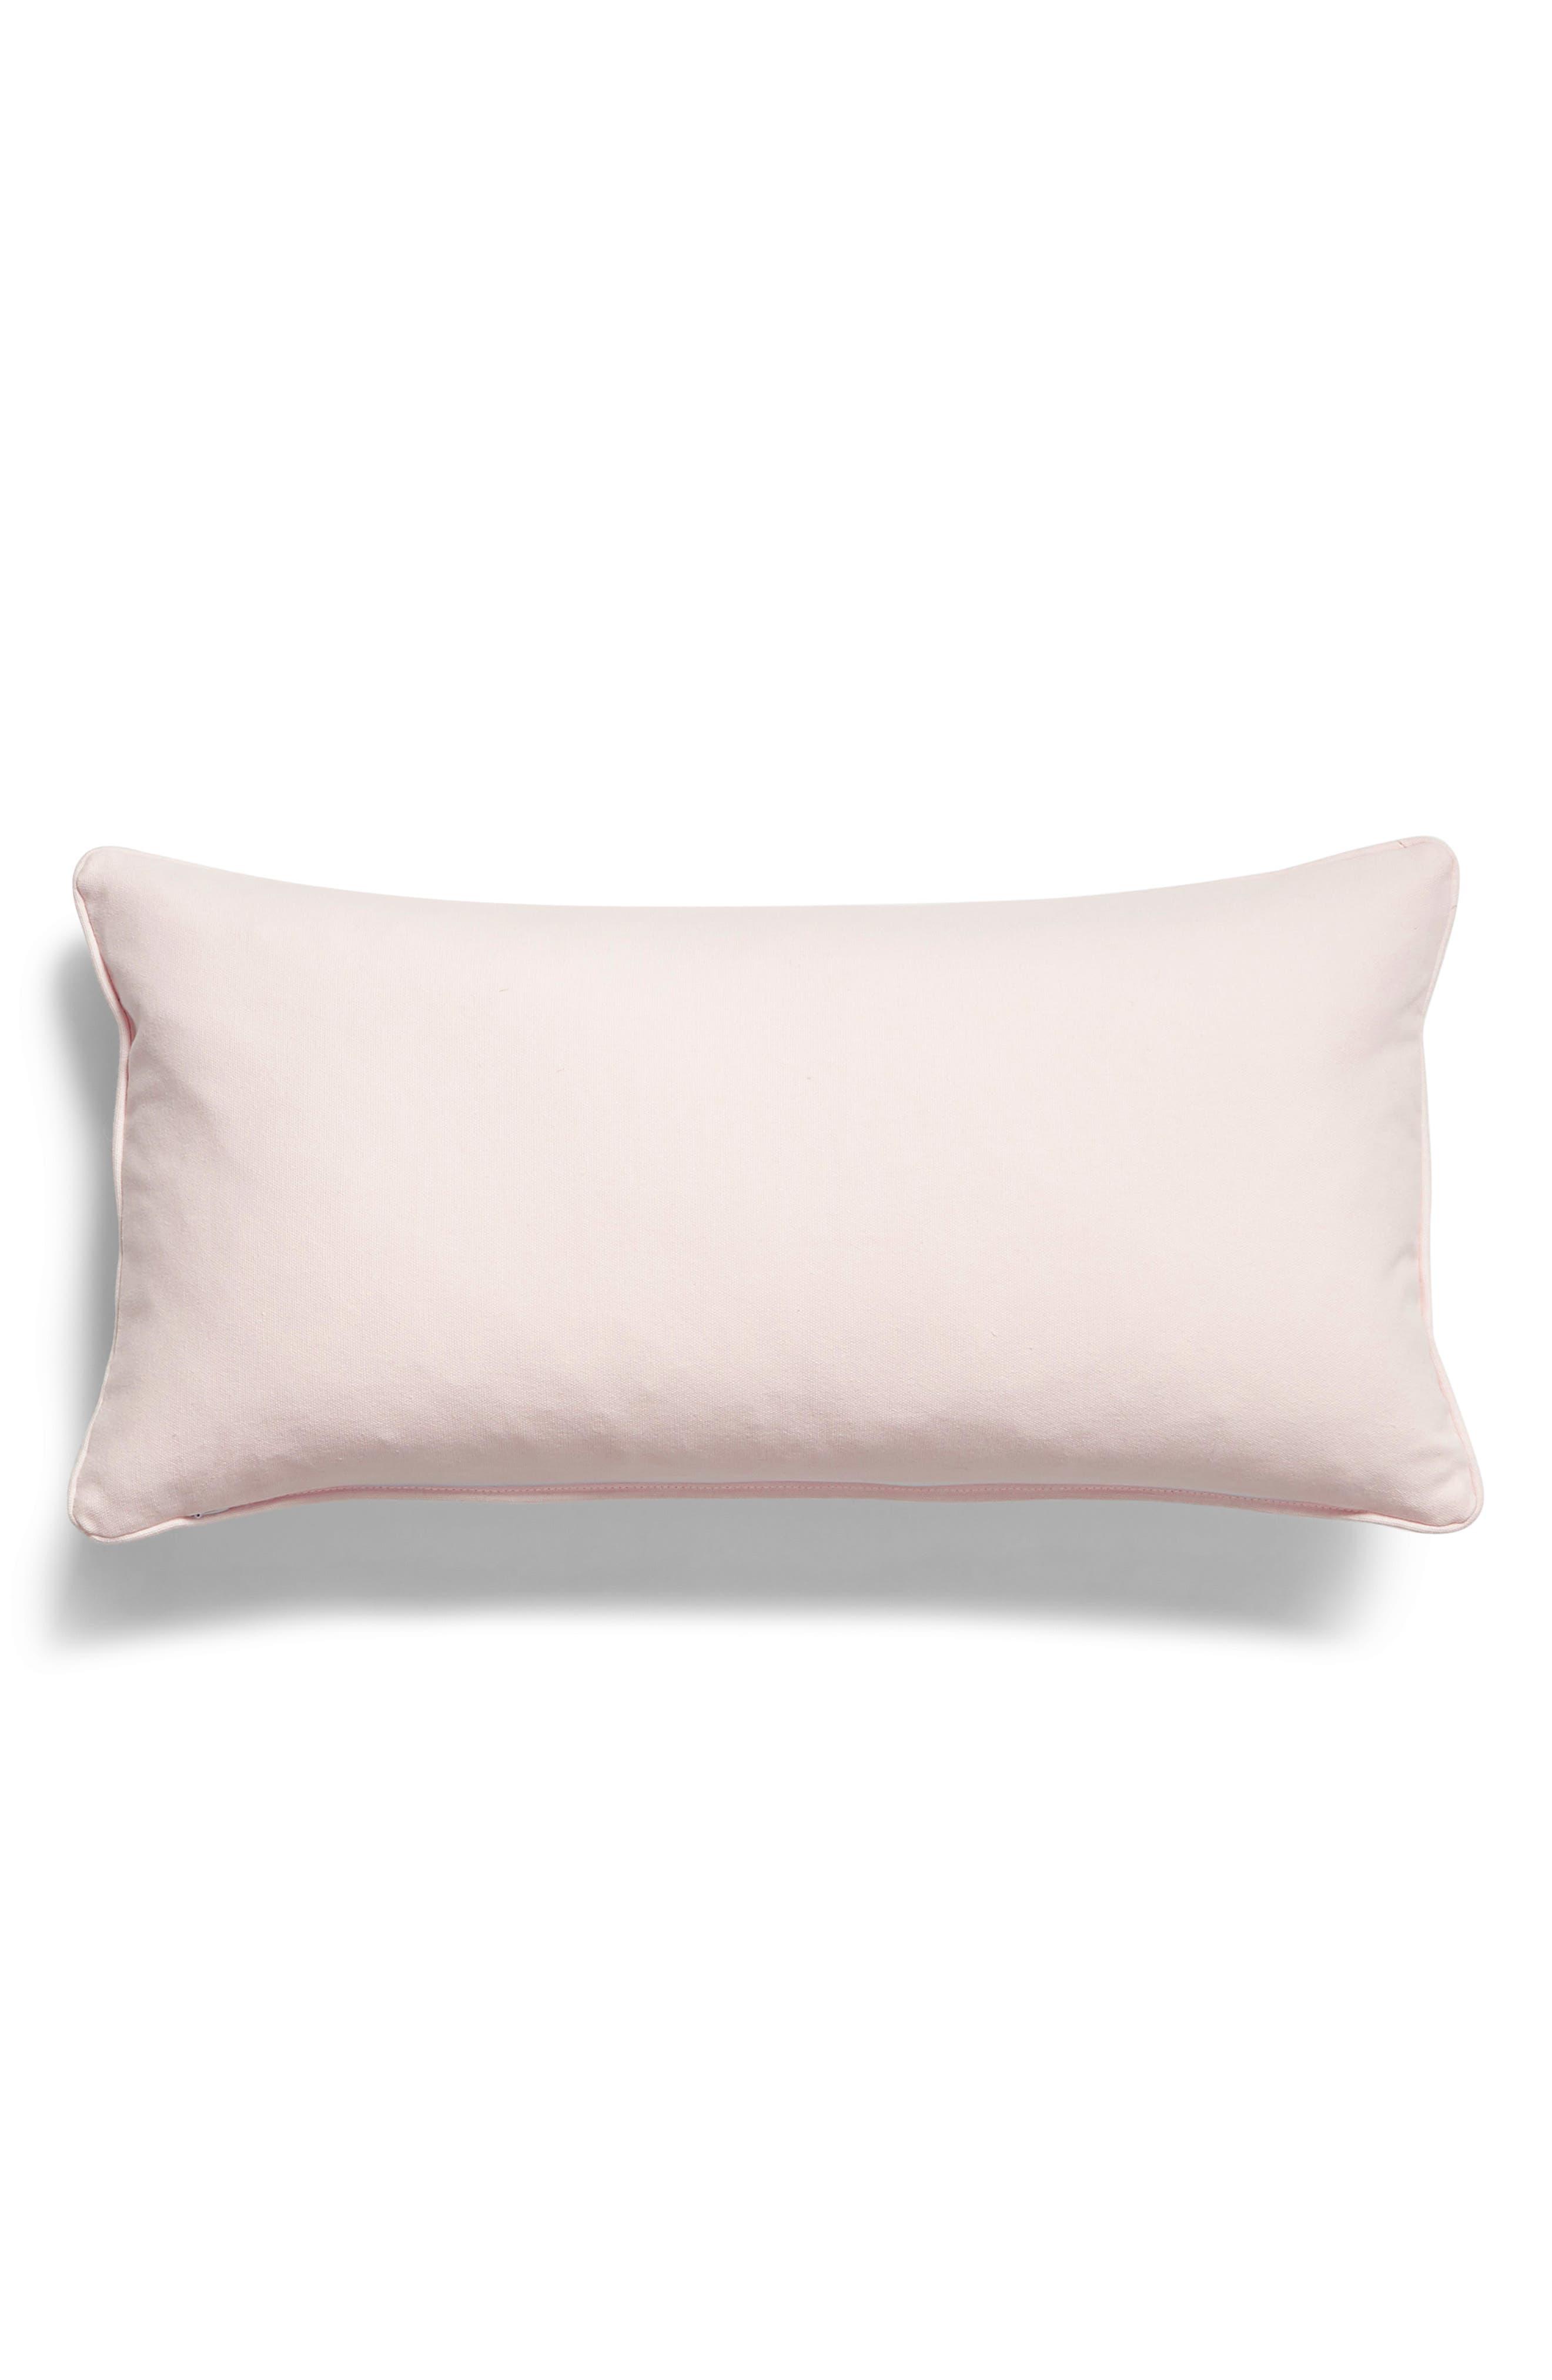 LEVTEX, Sequin Bunnies Accent Pillow, Alternate thumbnail 2, color, 650